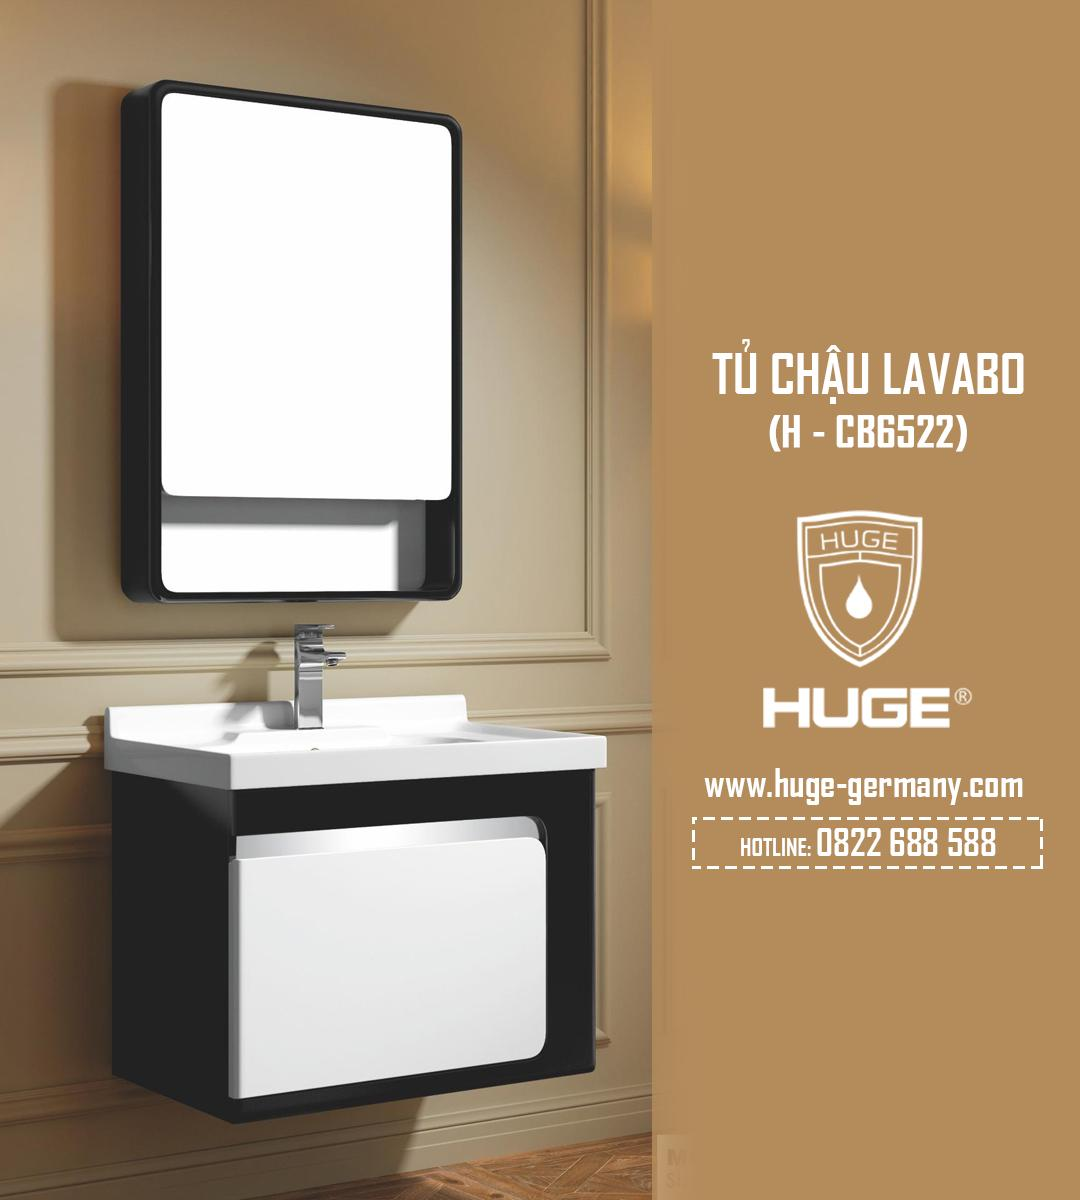 Tủ chậu lavabo 600 (H-CB6522)